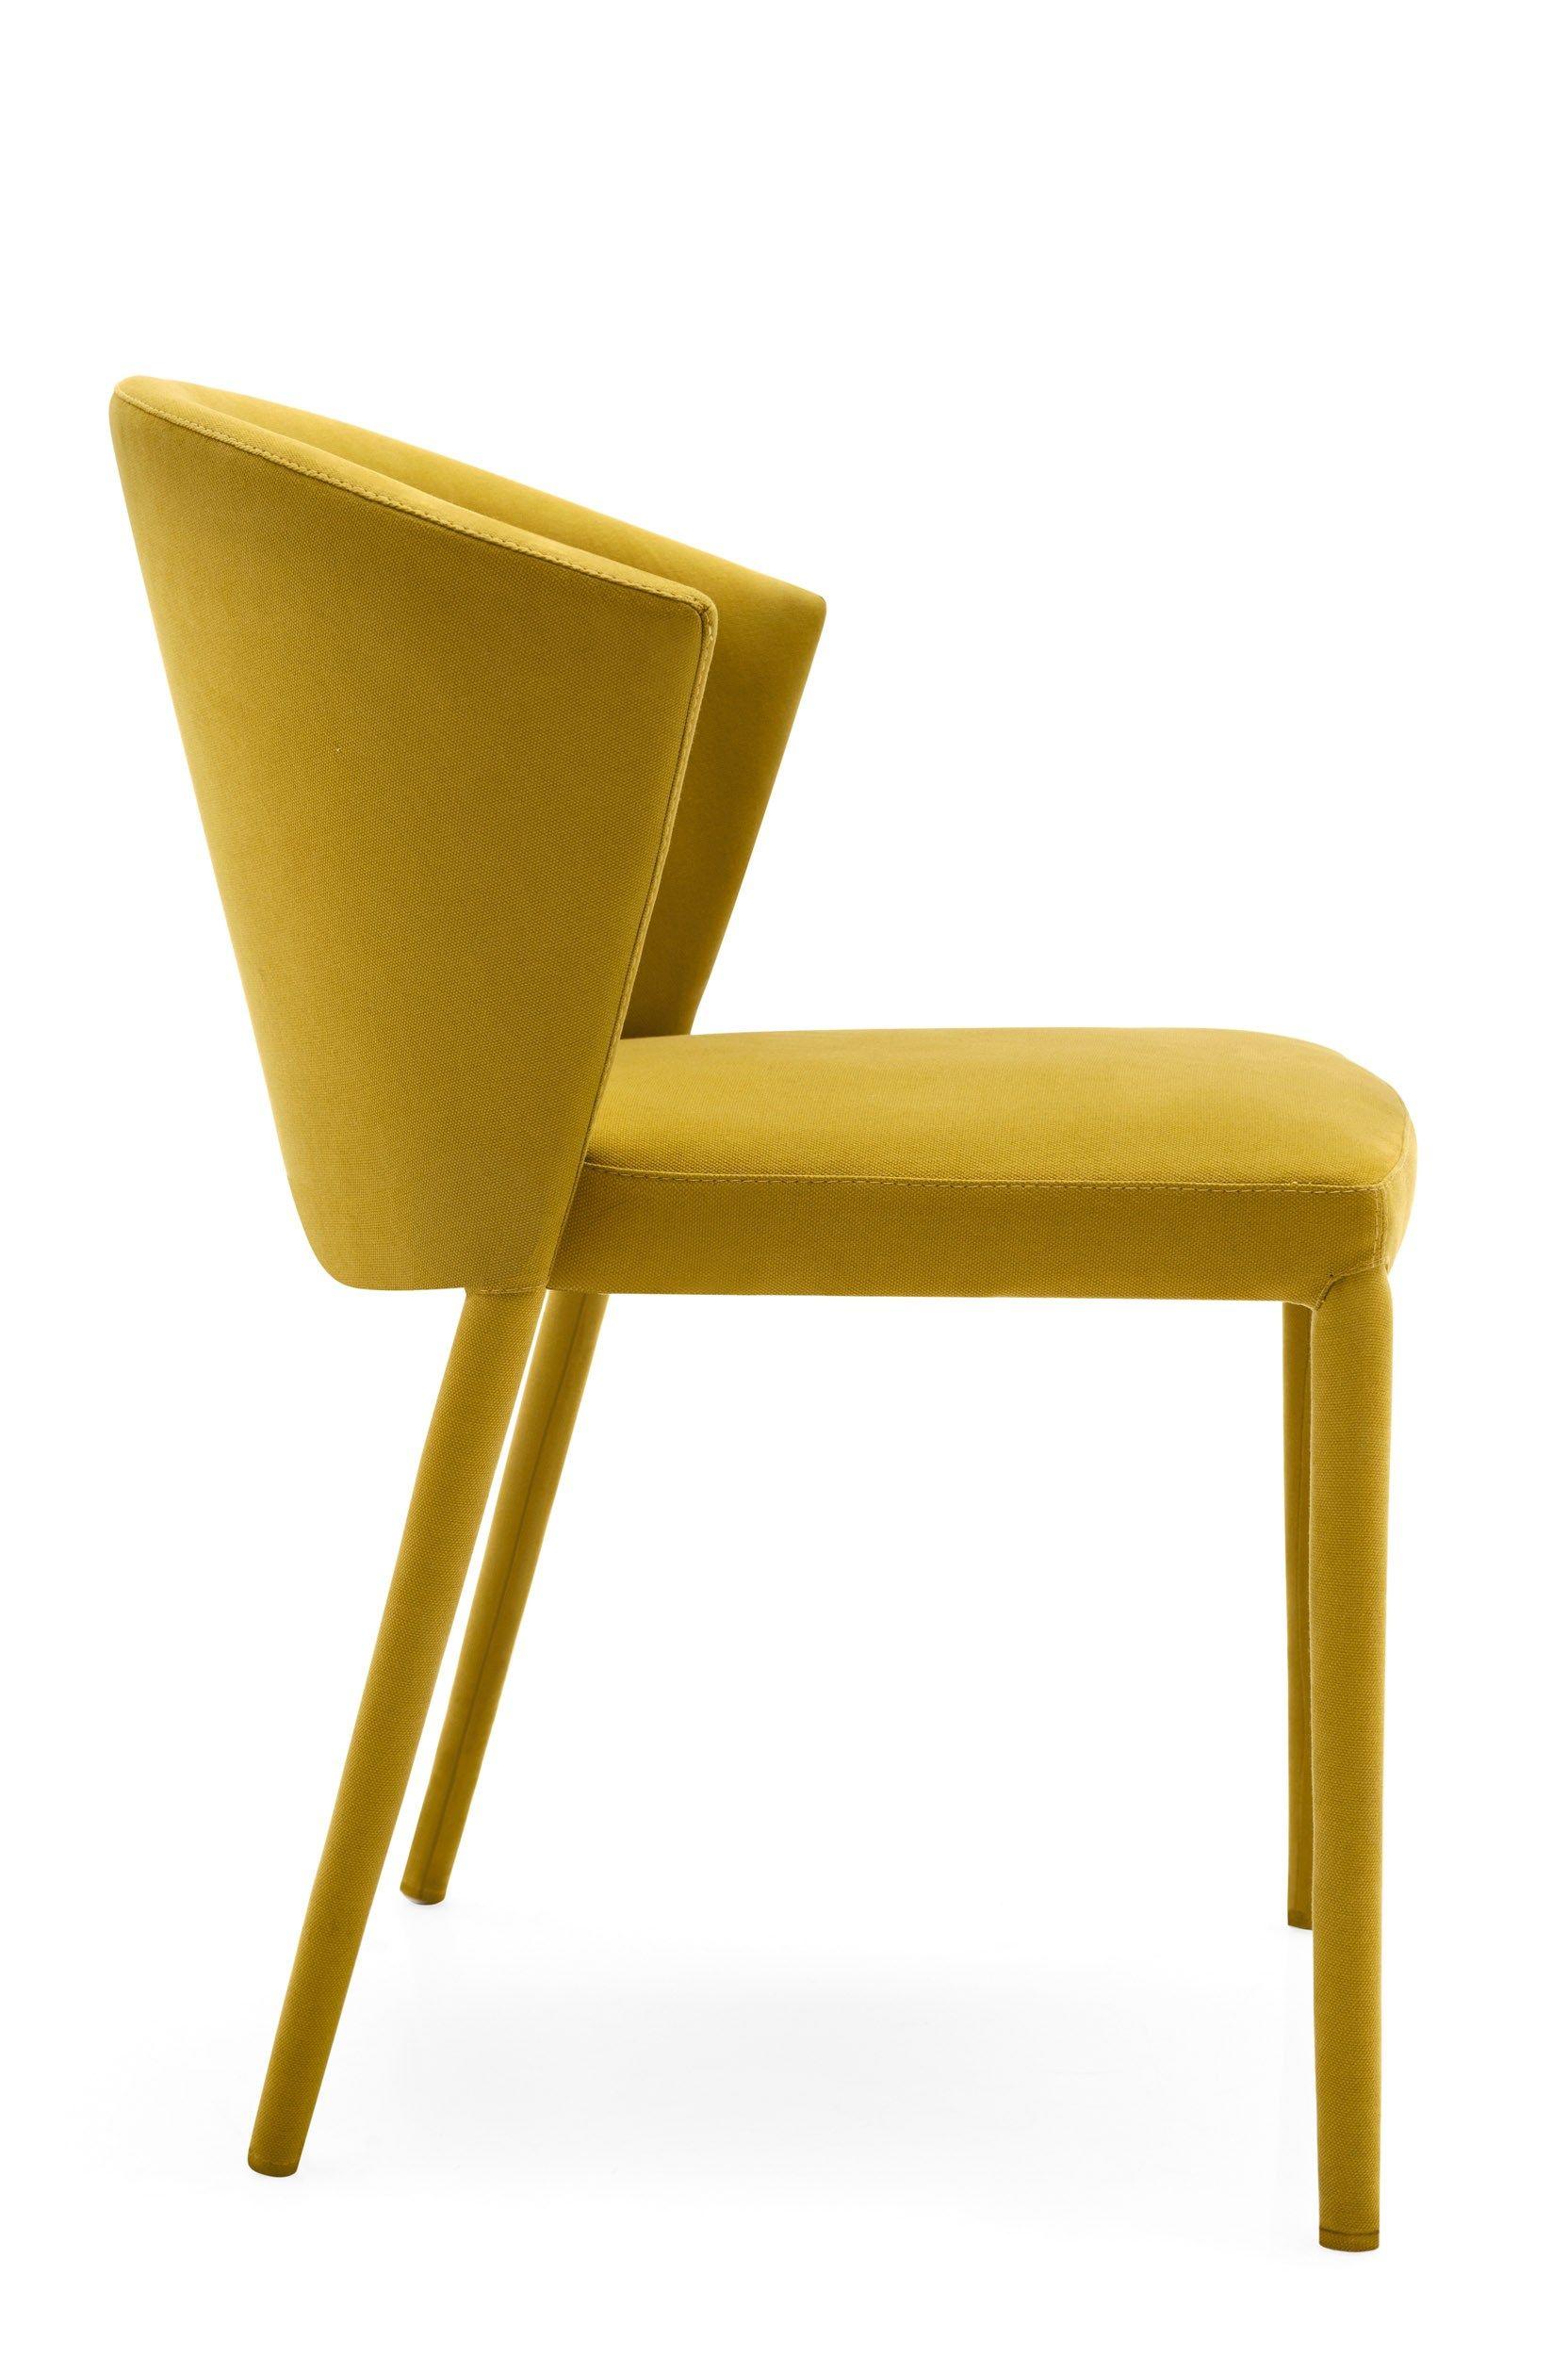 am lie chaise en cuir by calligaris design orlandini design. Black Bedroom Furniture Sets. Home Design Ideas